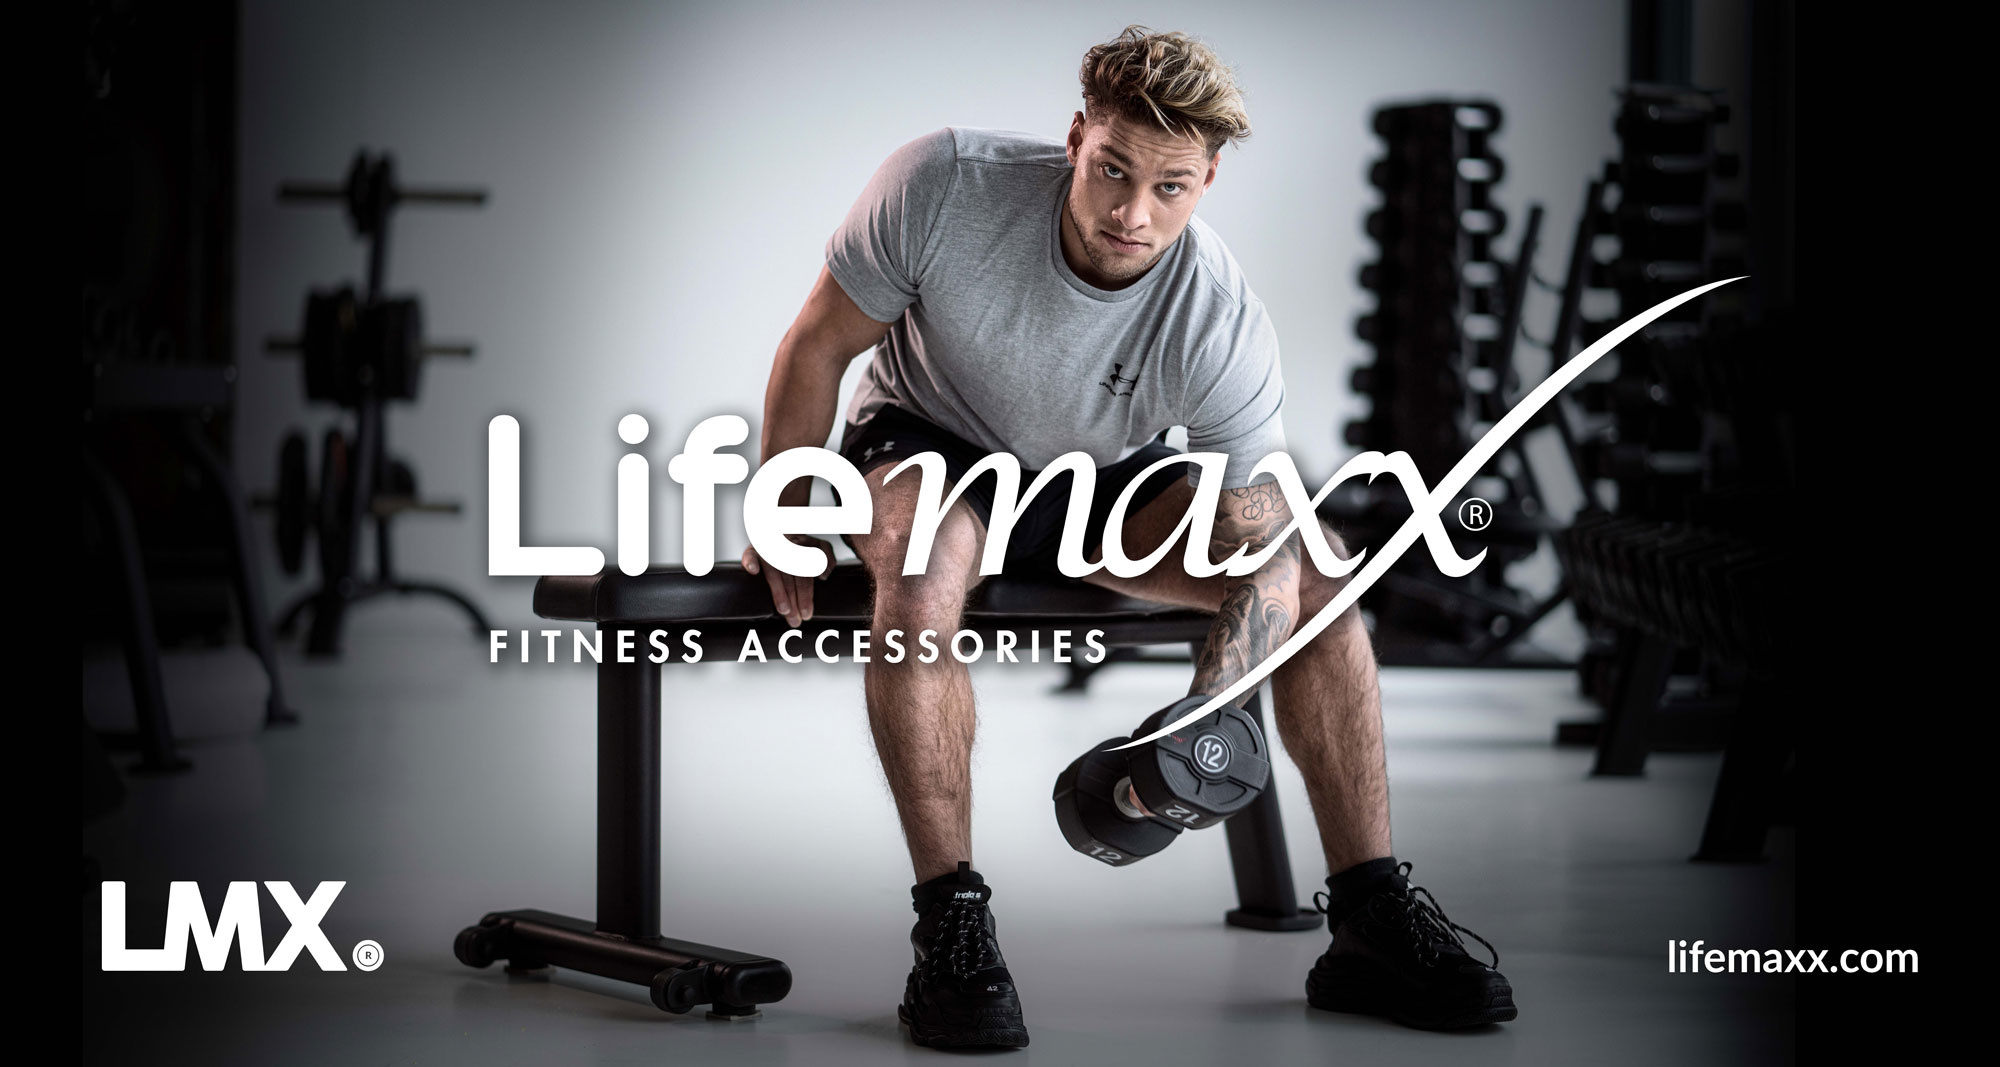 Lifemaxx® LMX2215 Lifemaxx banner 300x160cm